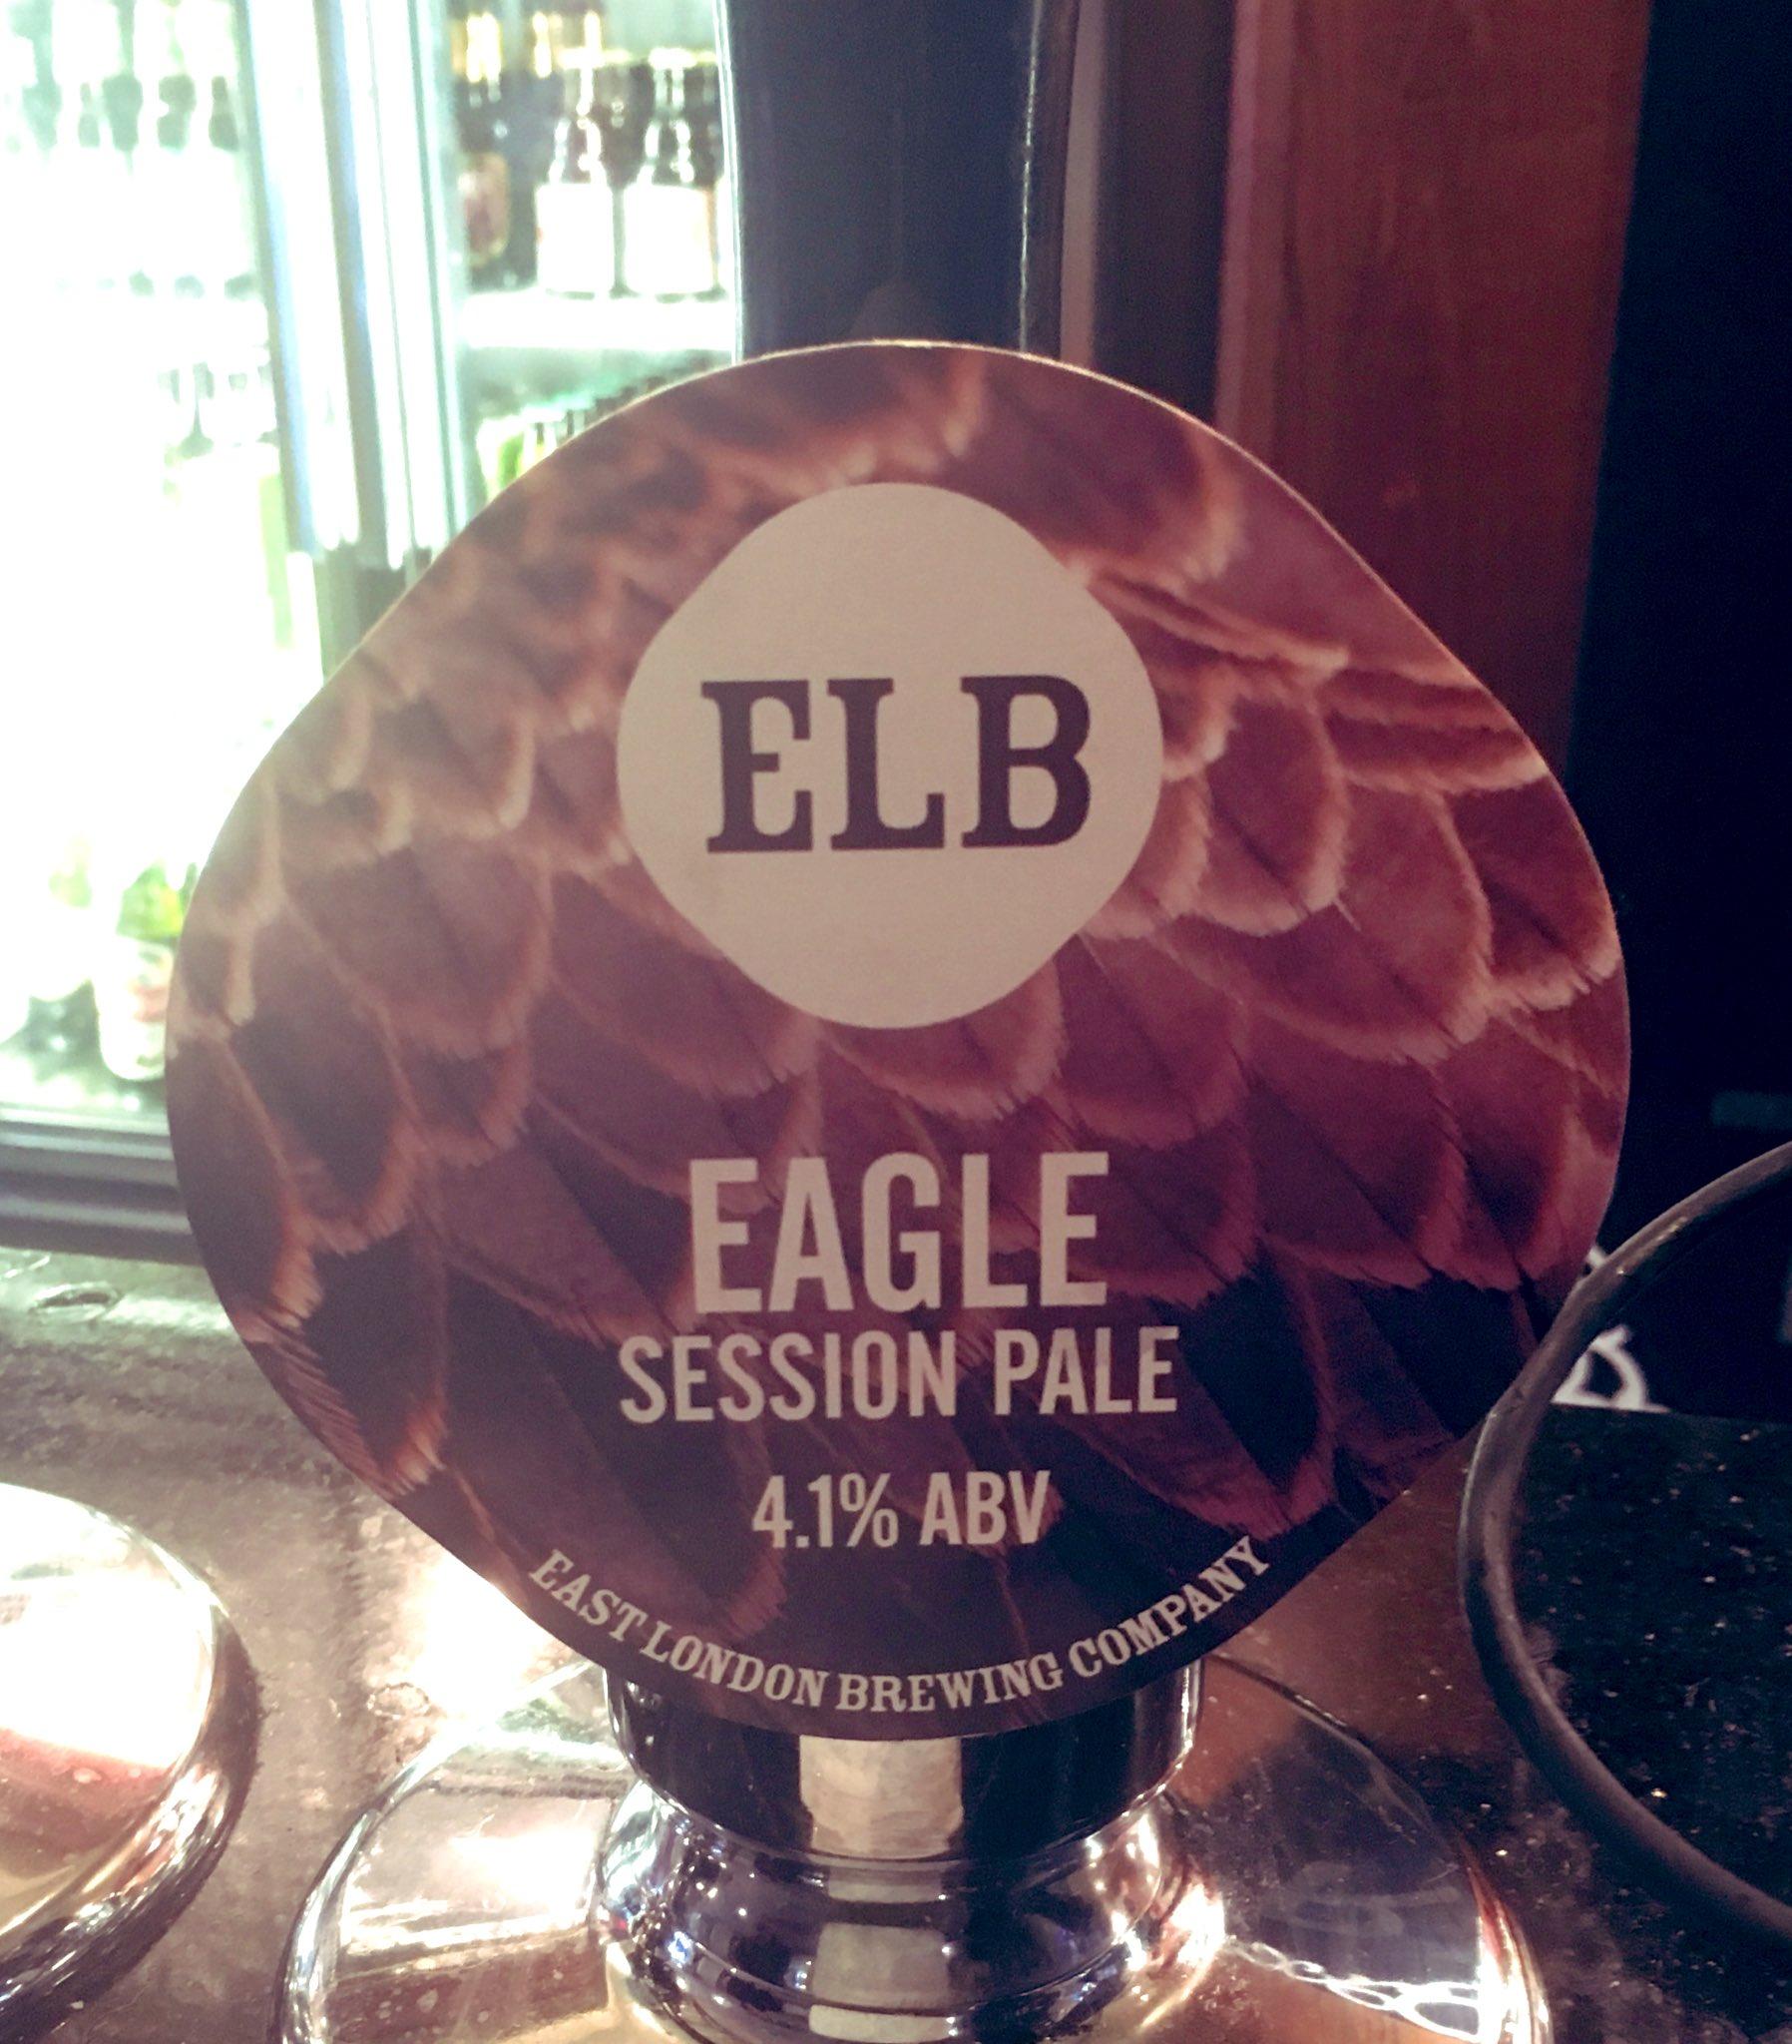 238: Eagle Session Pale